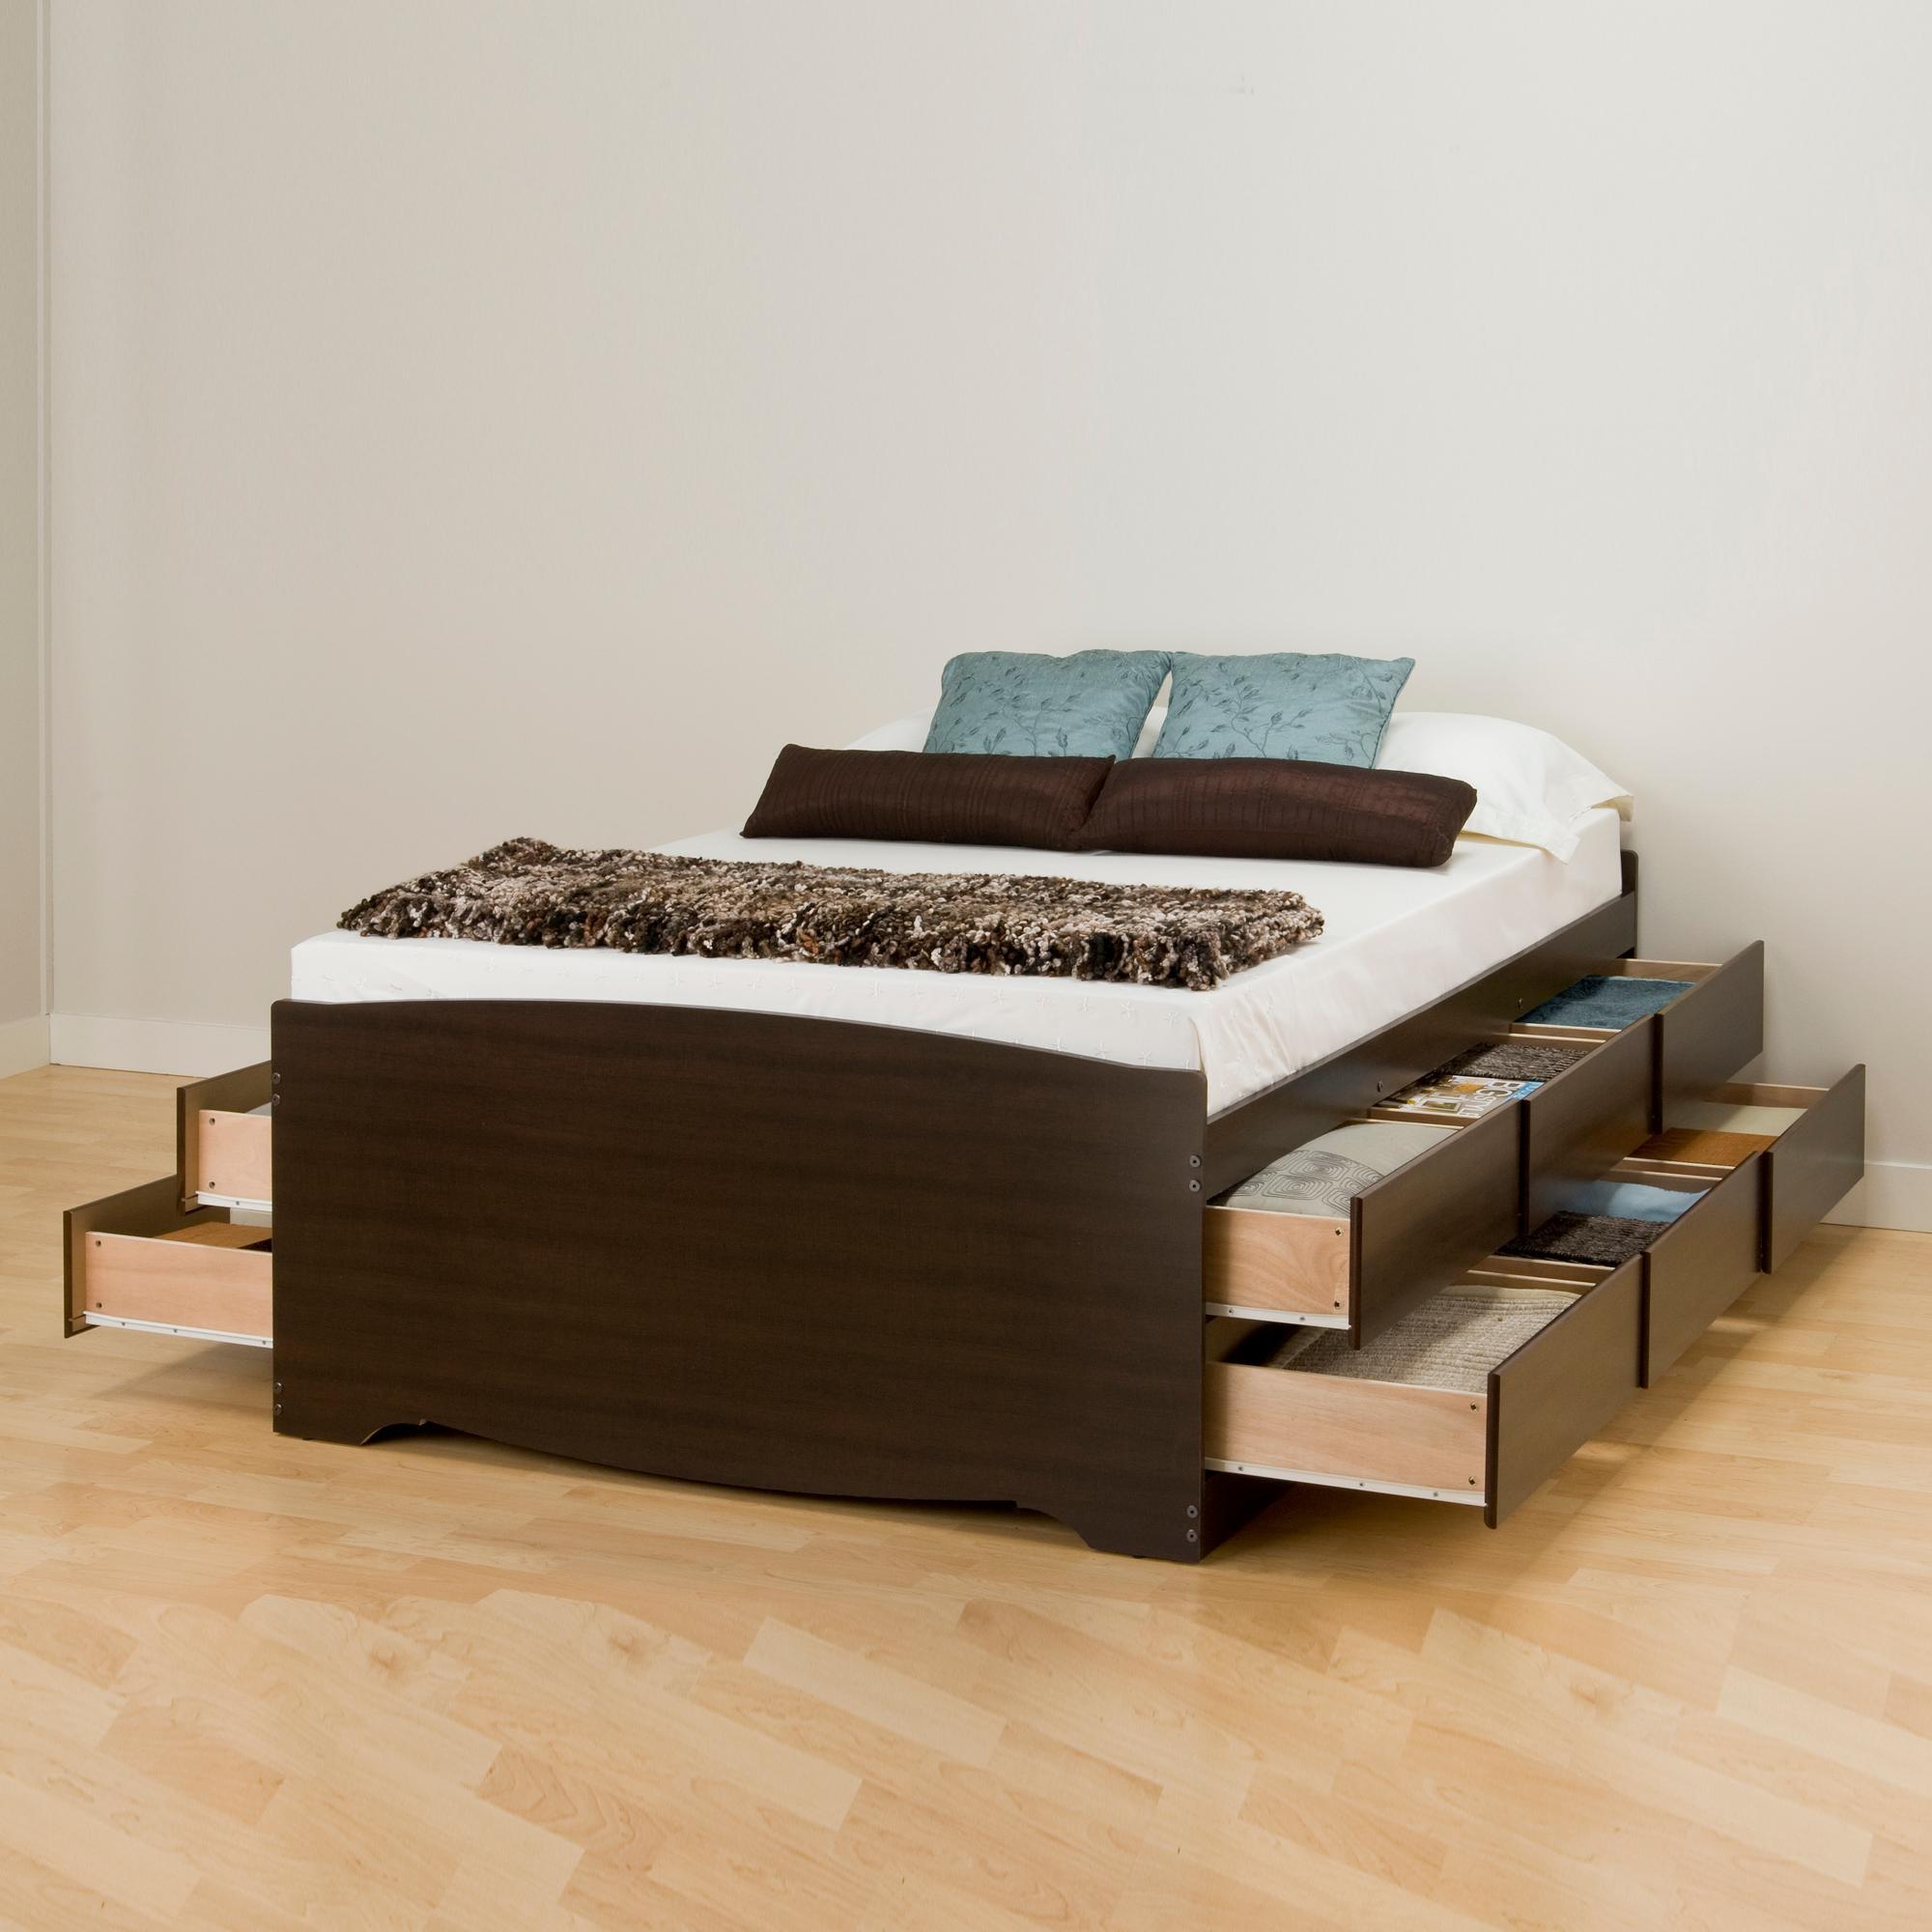 prepac platform storage bed assembly instructions